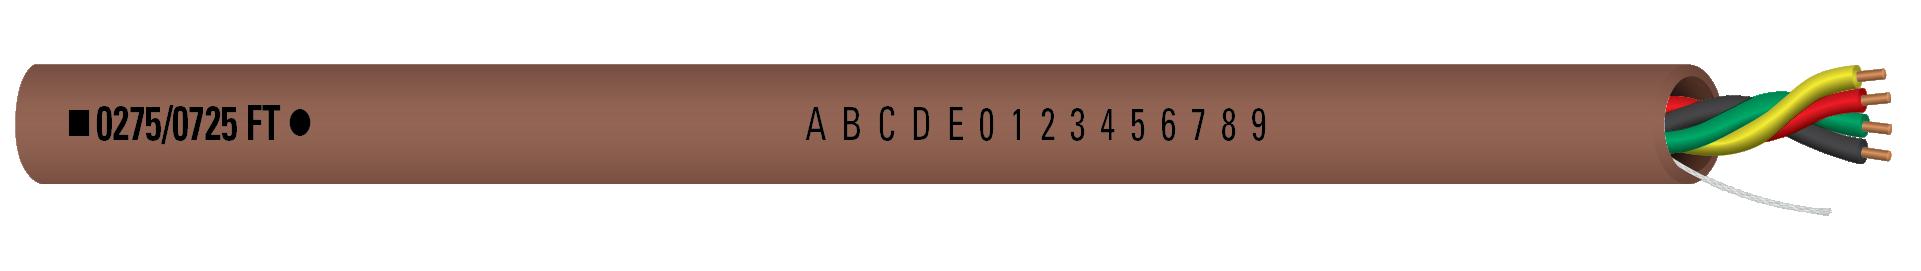 4253170